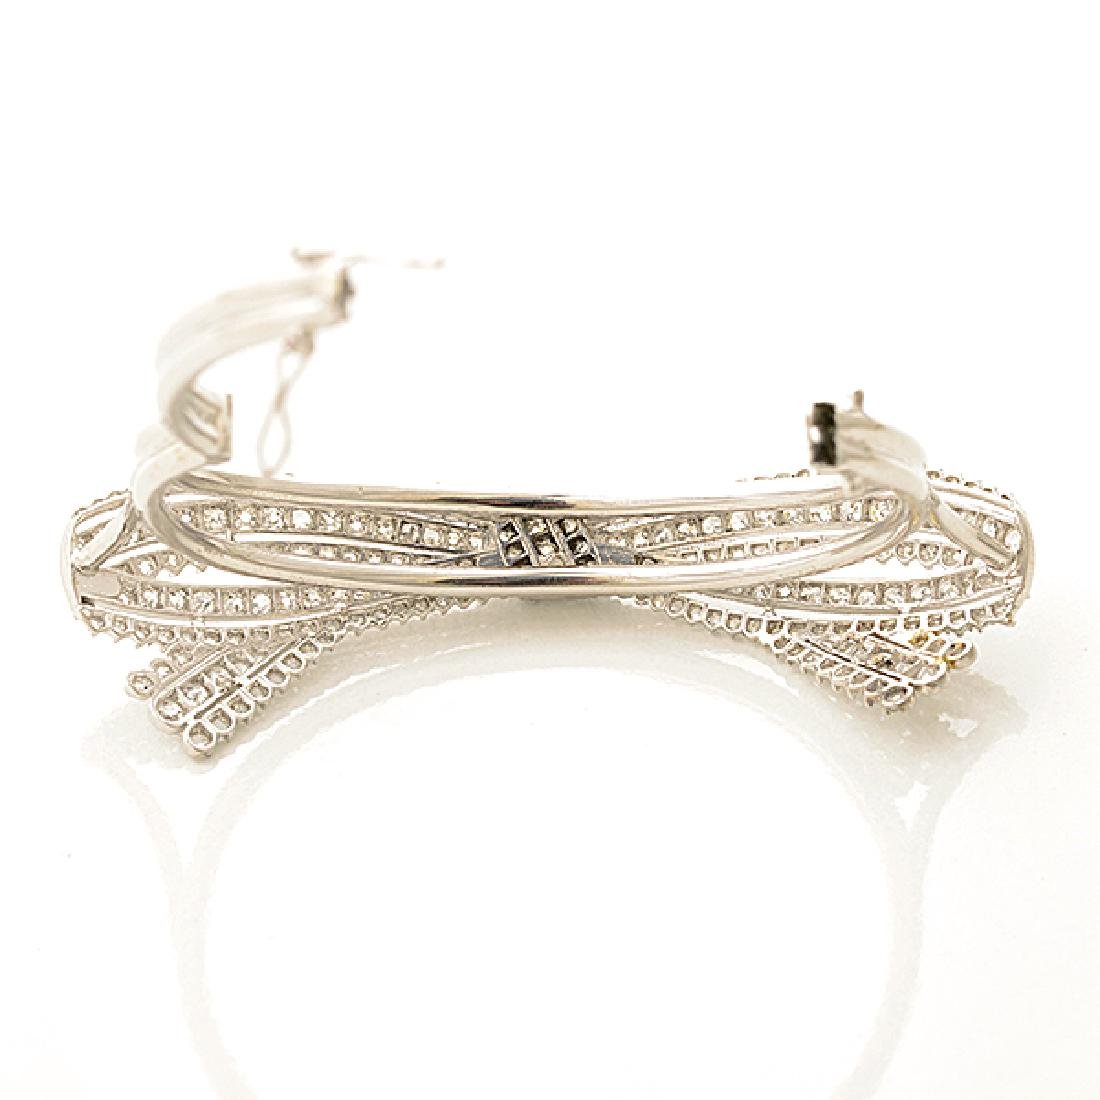 Diamond, Platinum Bow Bracelet. - 4